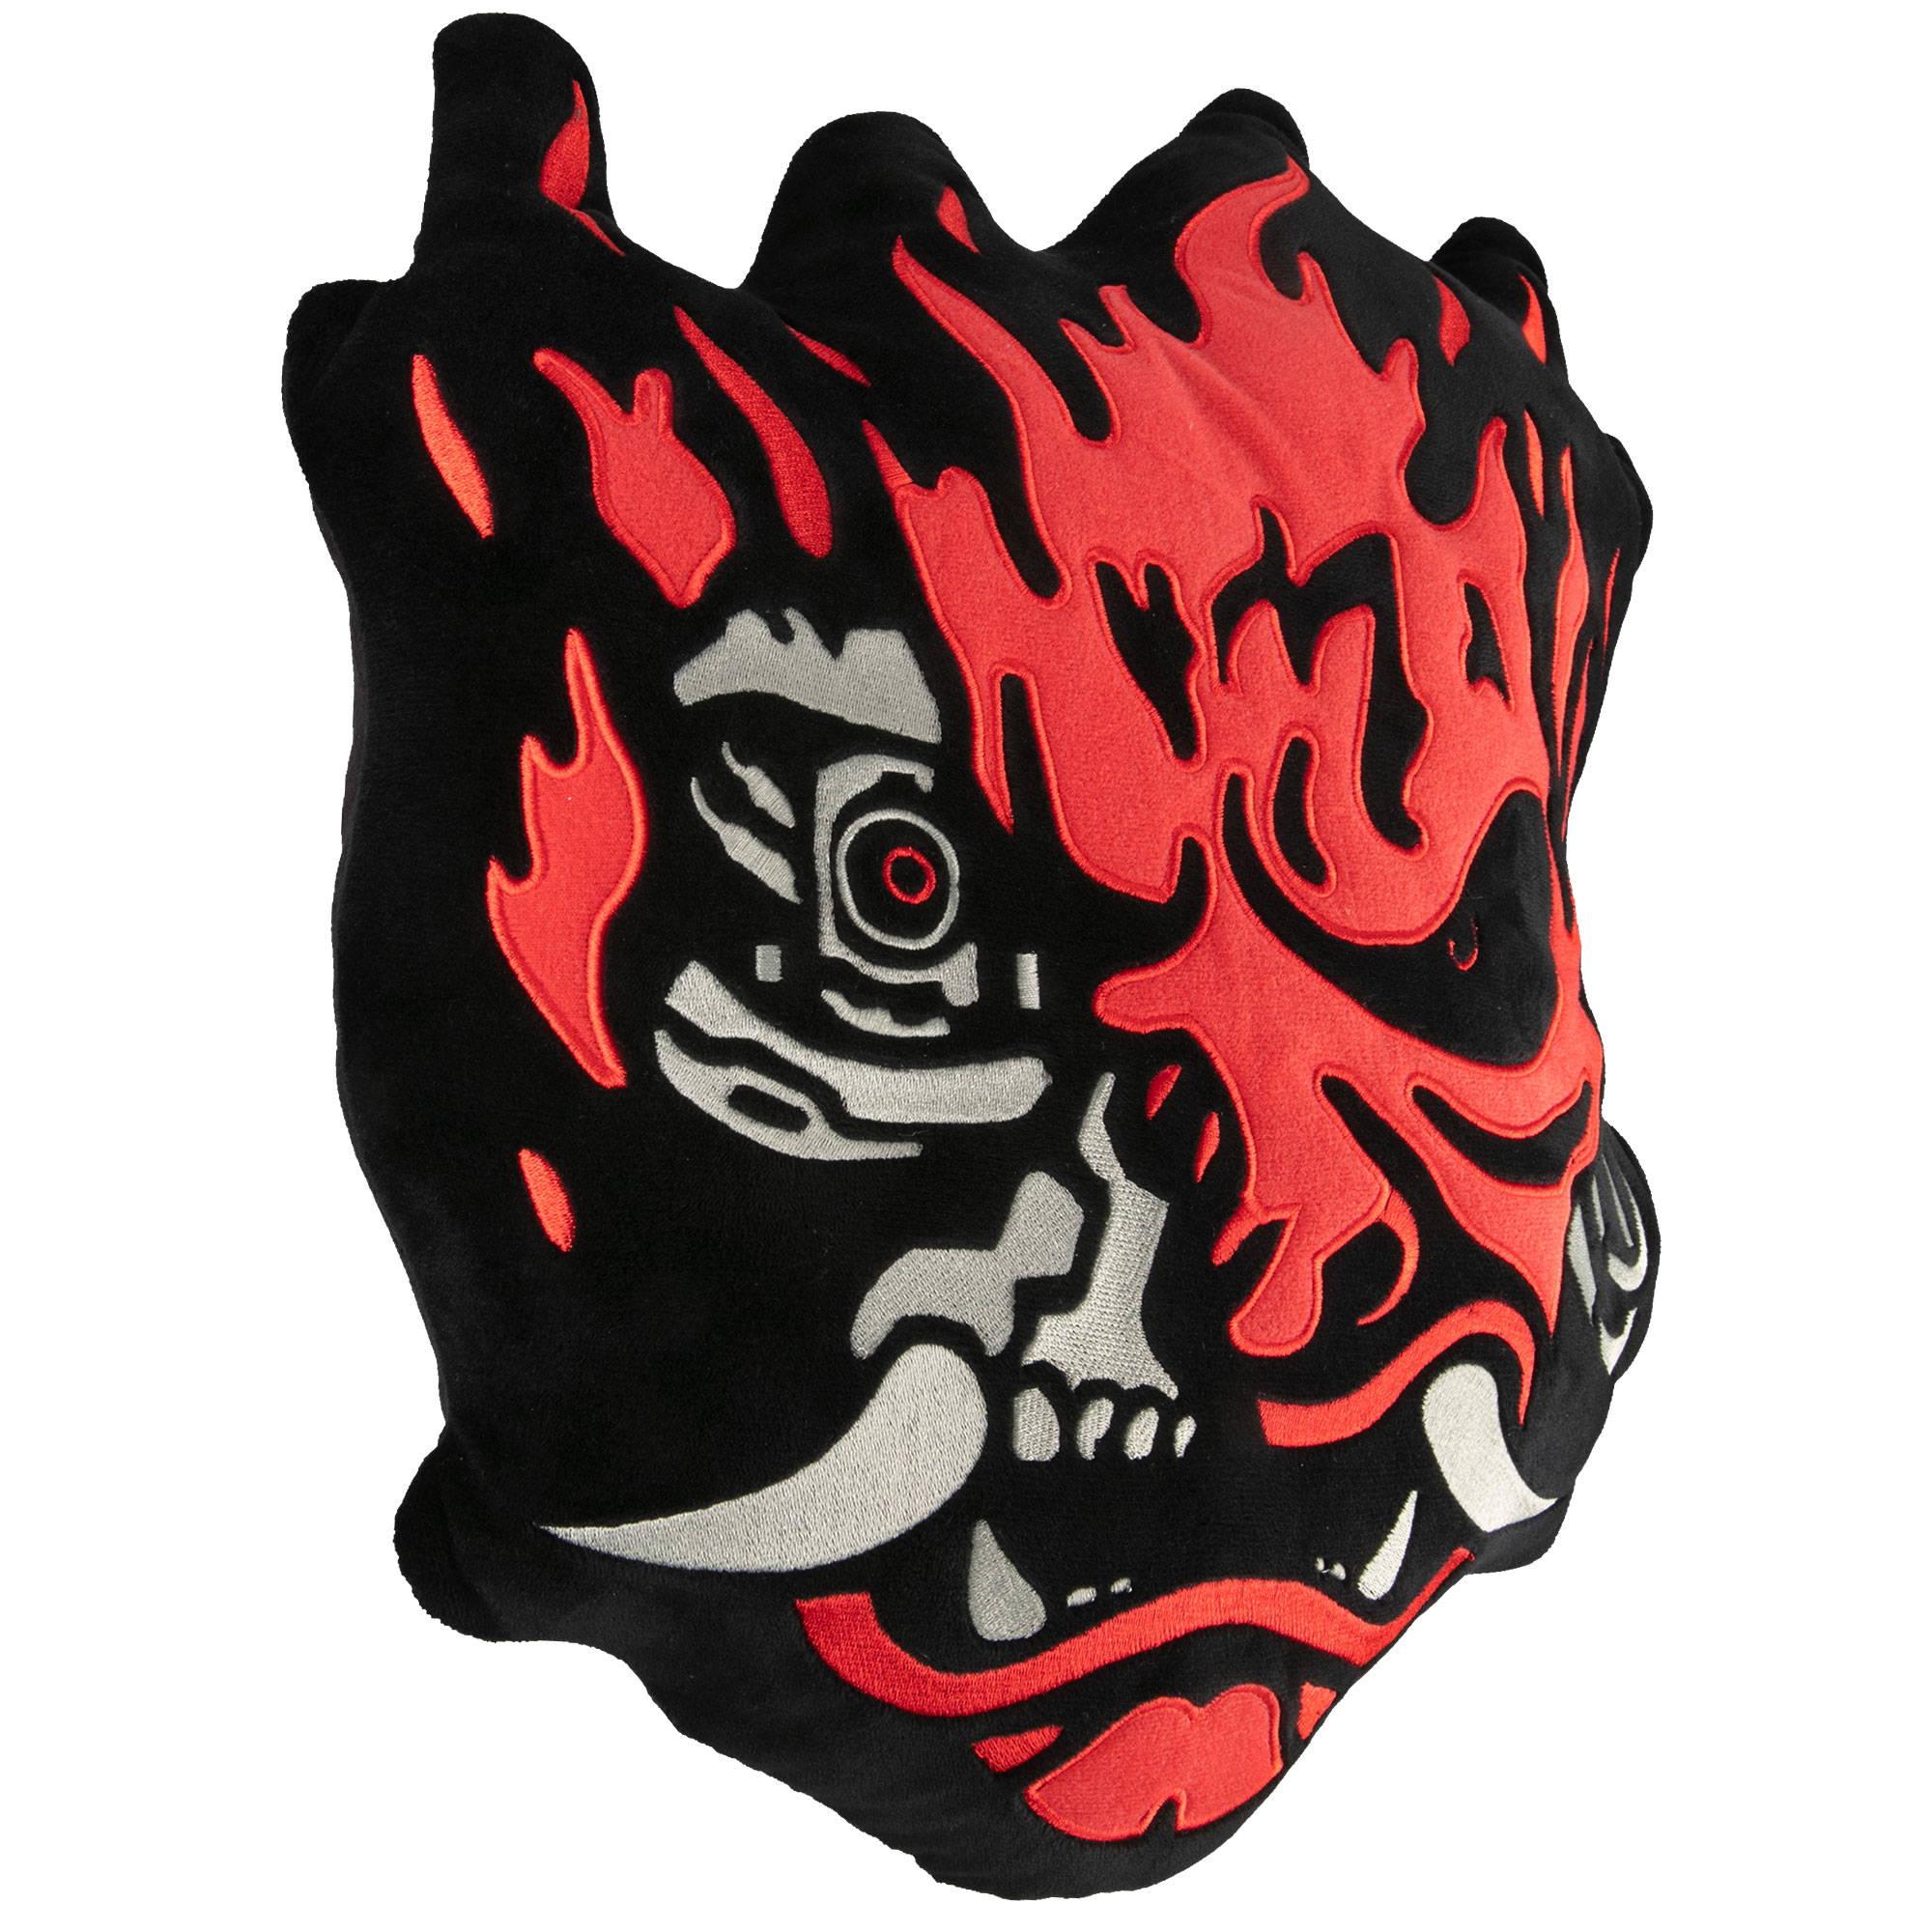 Product image of the Cyberpunk 2077 Samurai Pillow Plush